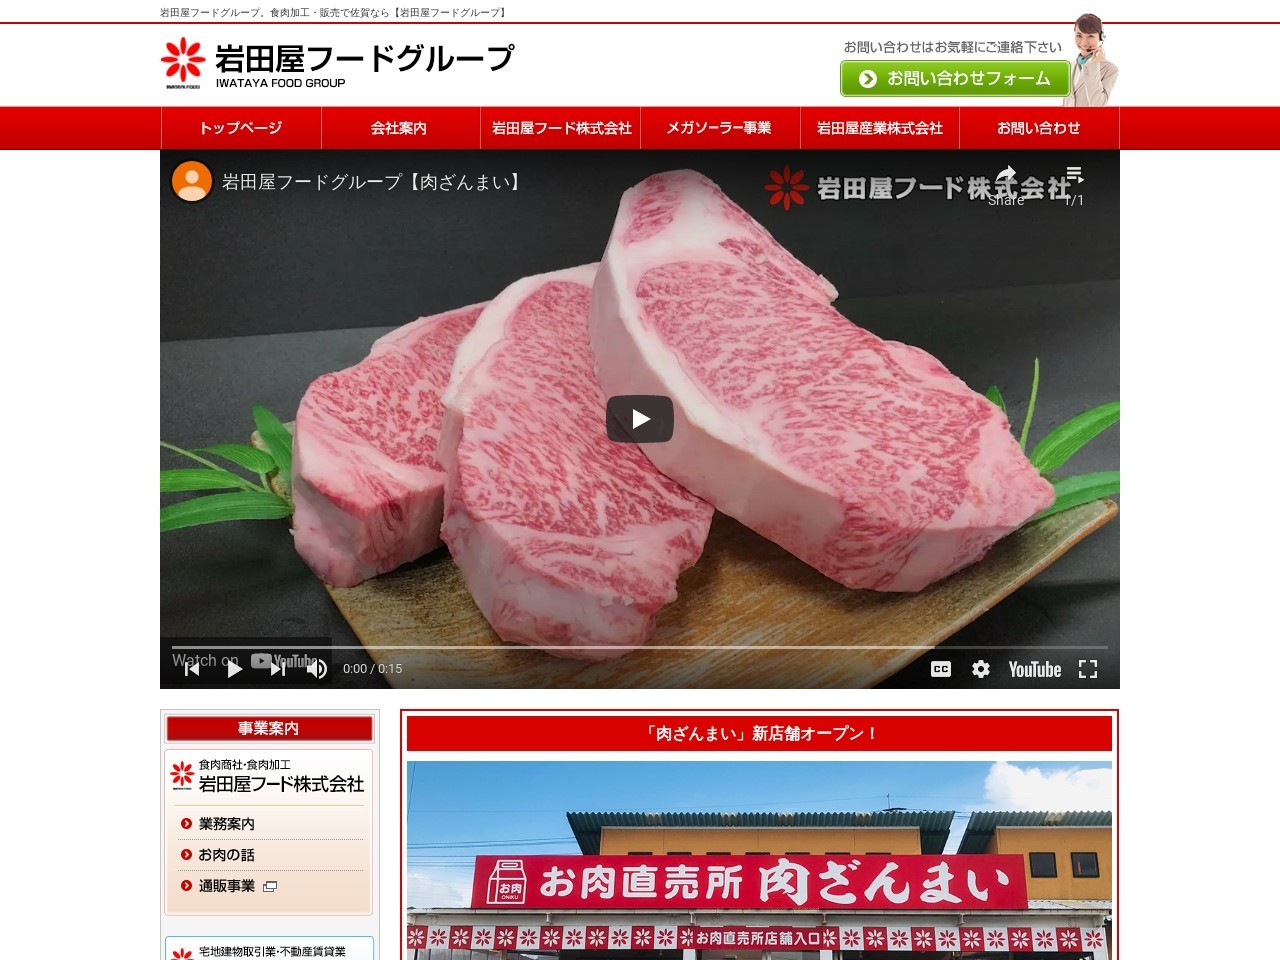 岩田屋フード株式会社